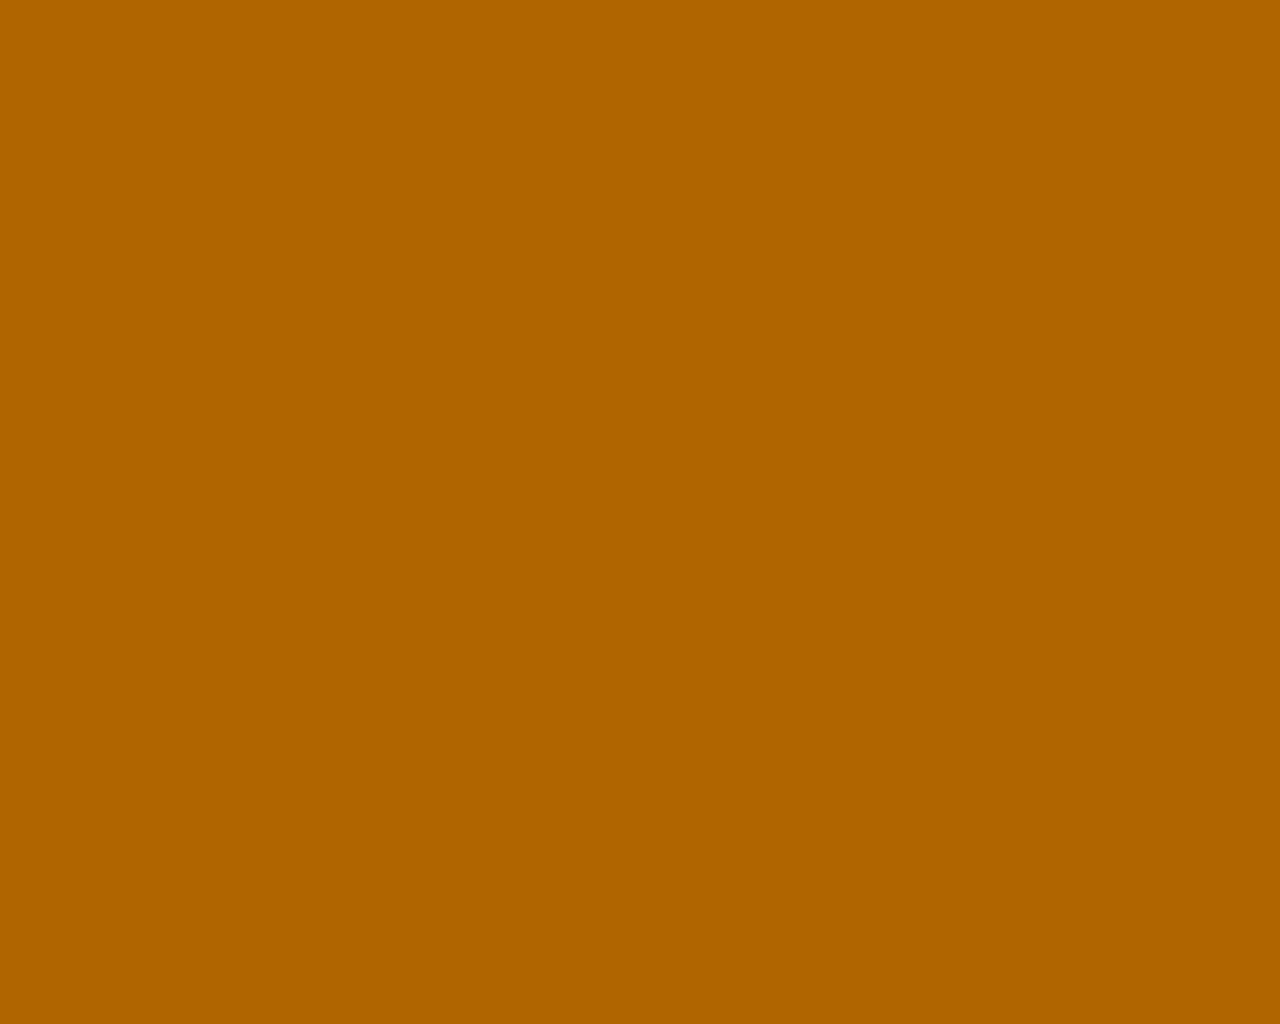 1280x1024 Ginger Solid Color Background